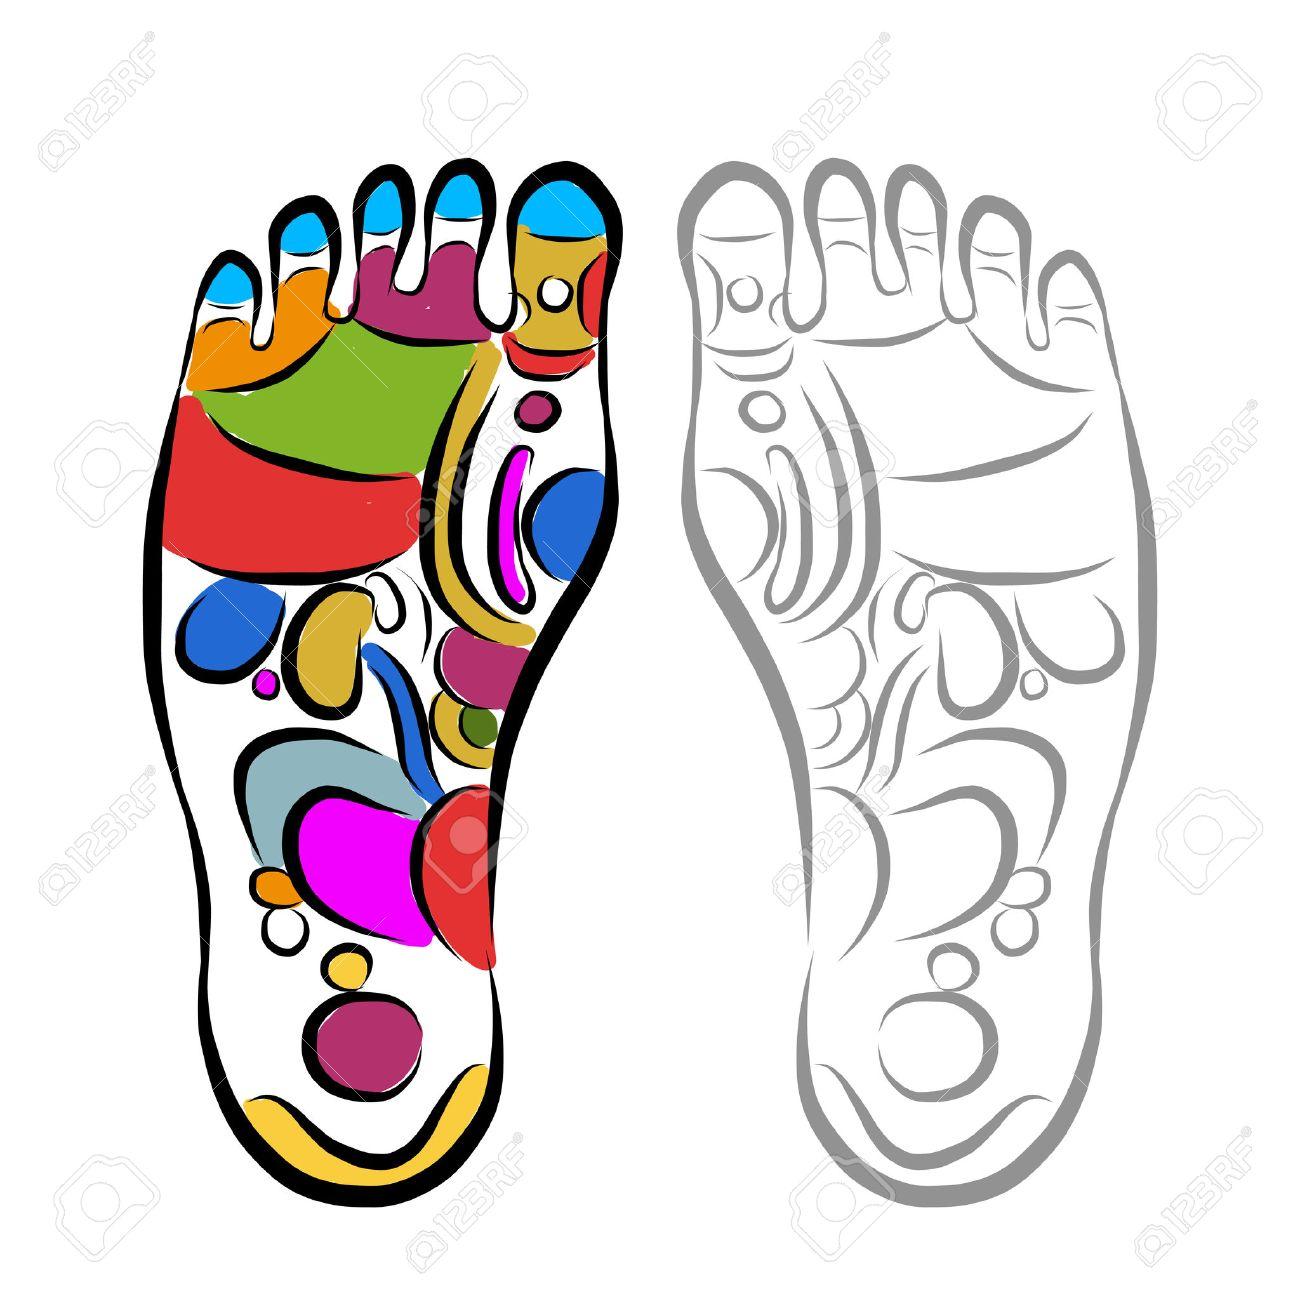 Großzügig Fußmassage Anatomie Fotos - Anatomie Ideen - finotti.info